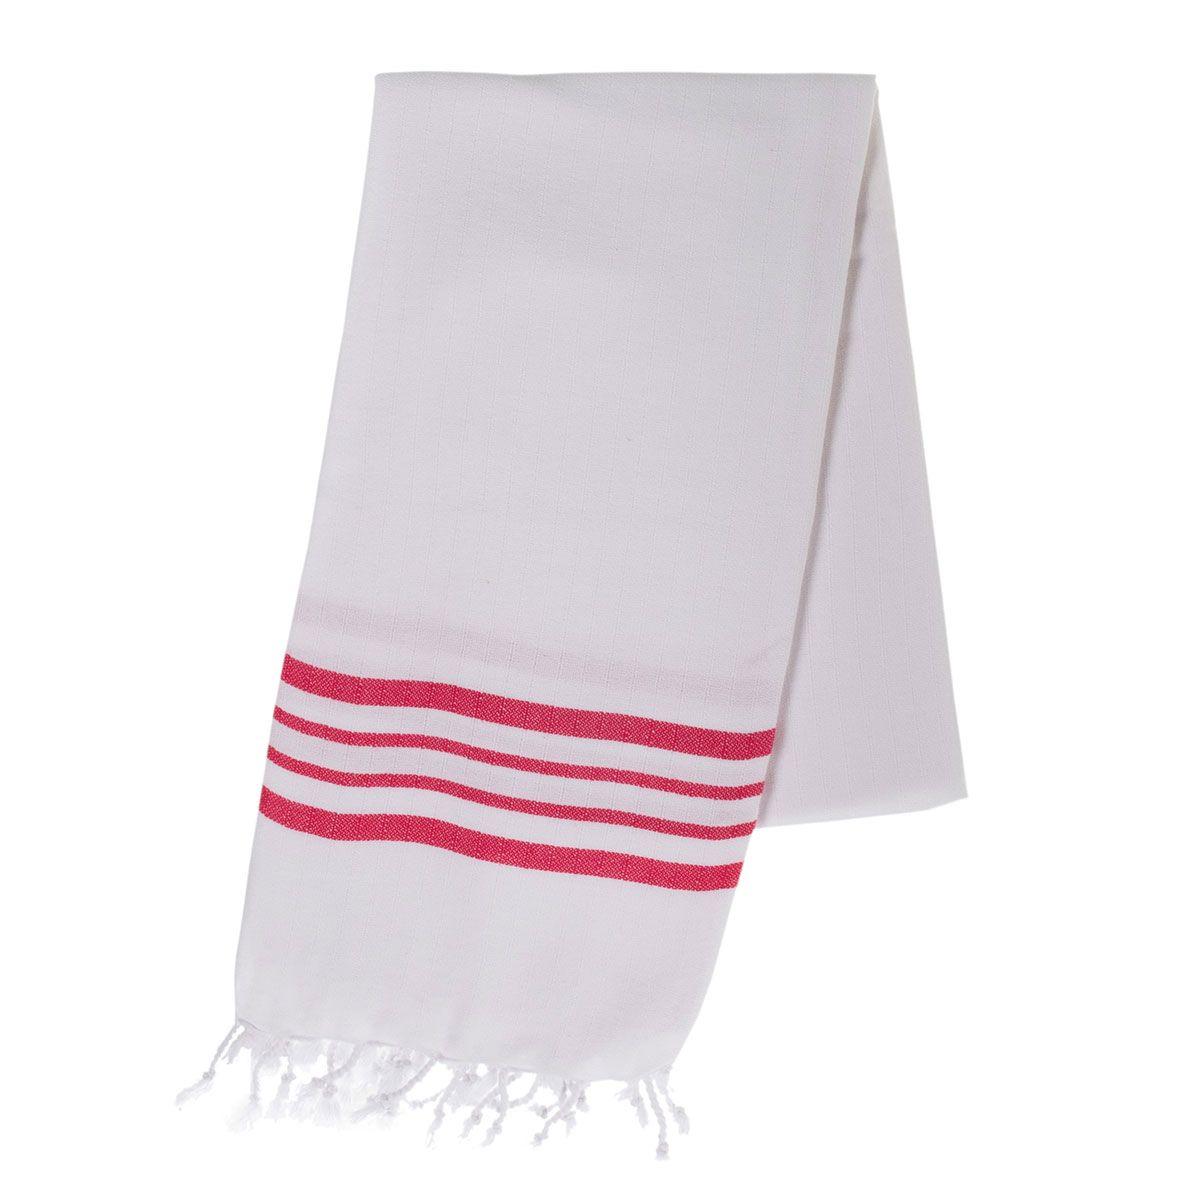 Peshtemal White Sultan / Fucshia Stripes